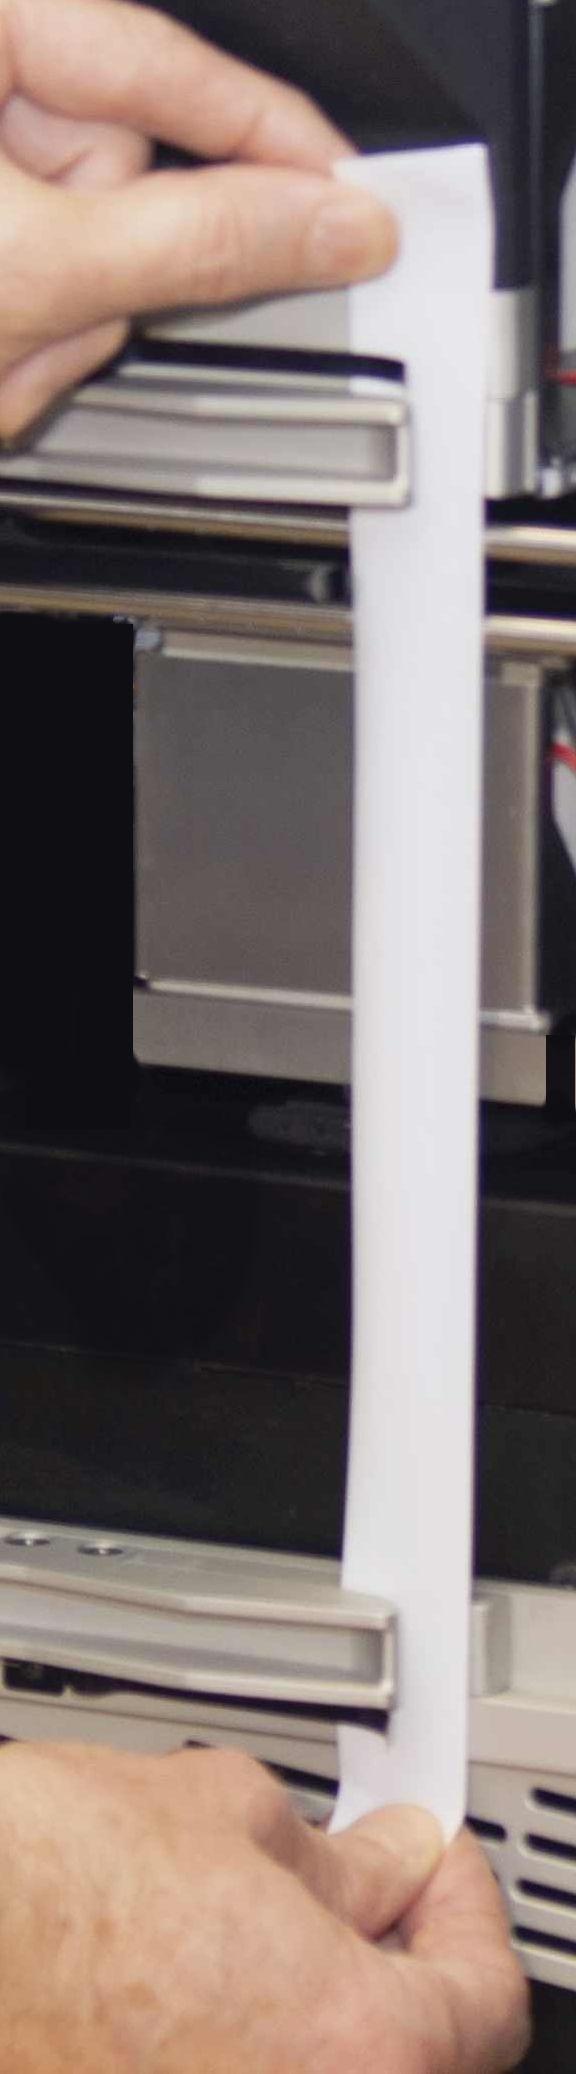 Heat seal sample loading